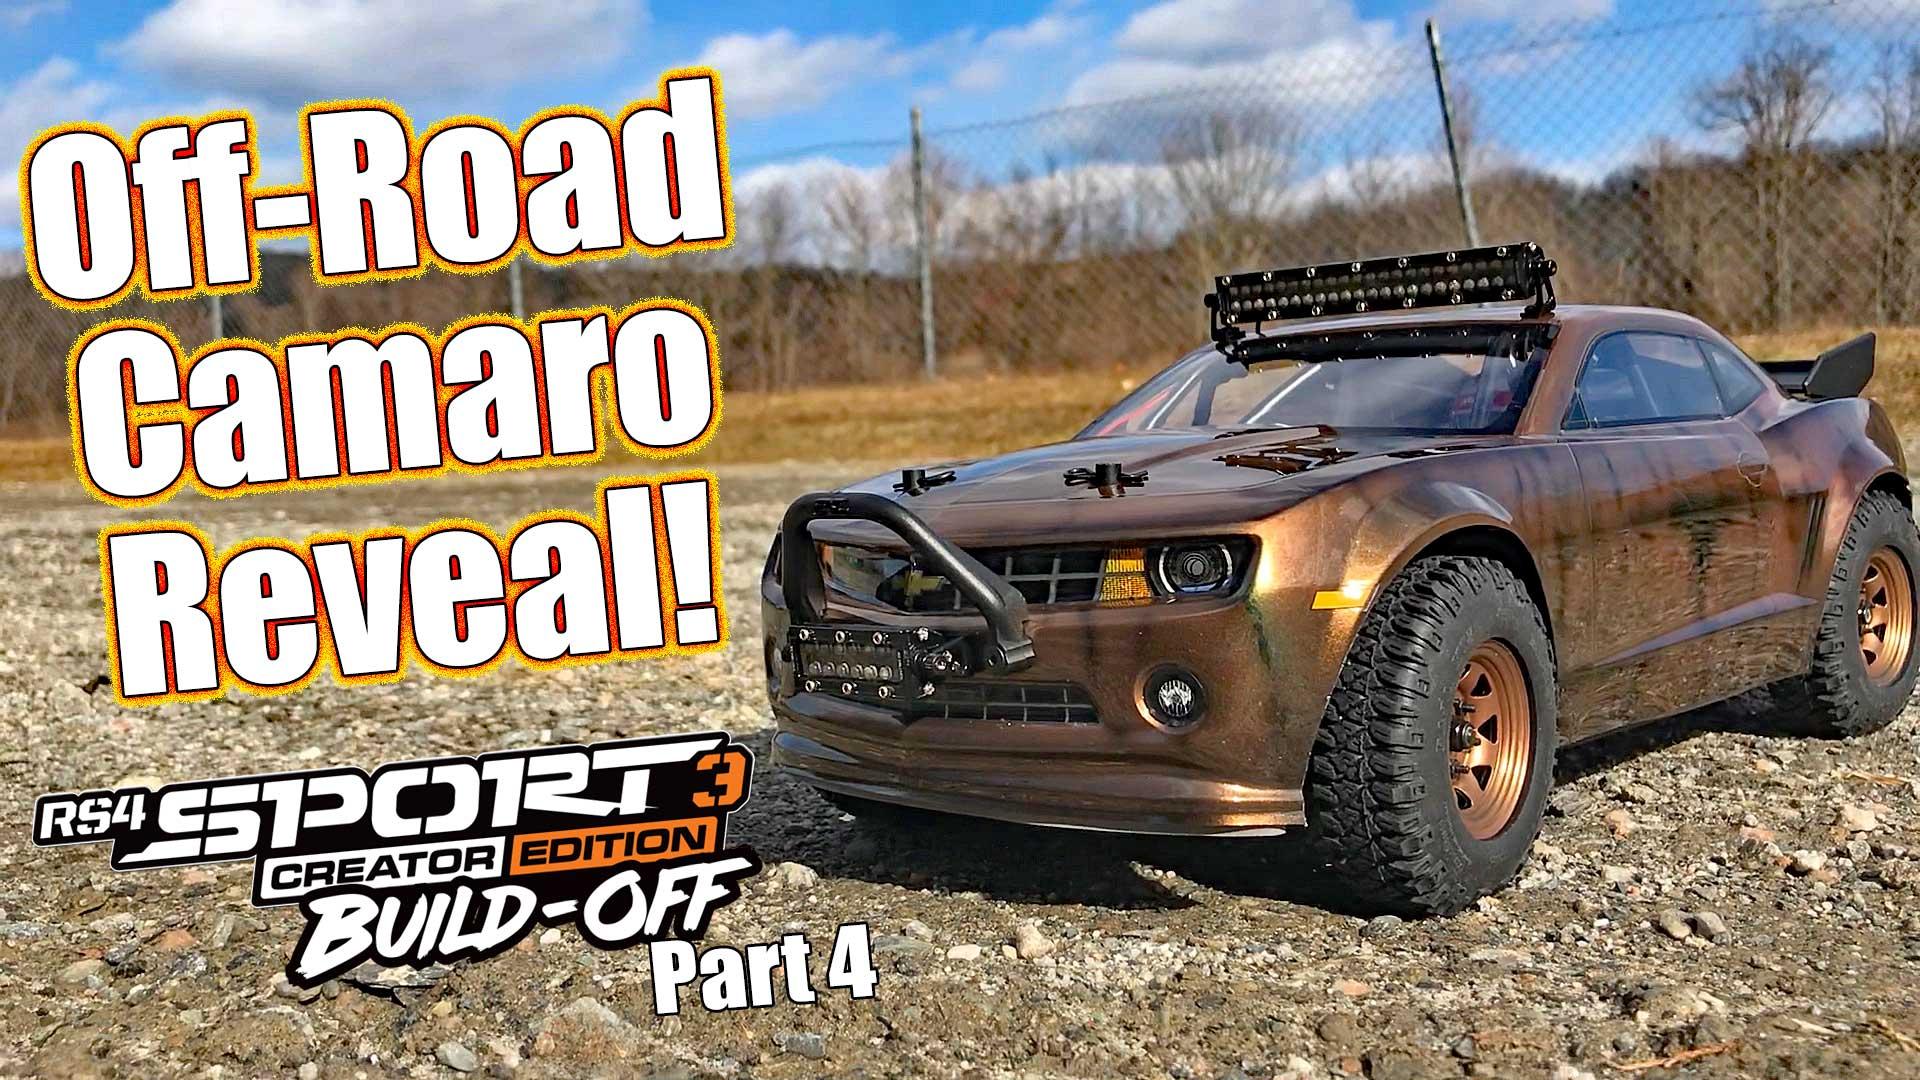 WILD Off-Road Camaro! - HPI Racing RS4 Sport 3 Build-Off Part 4